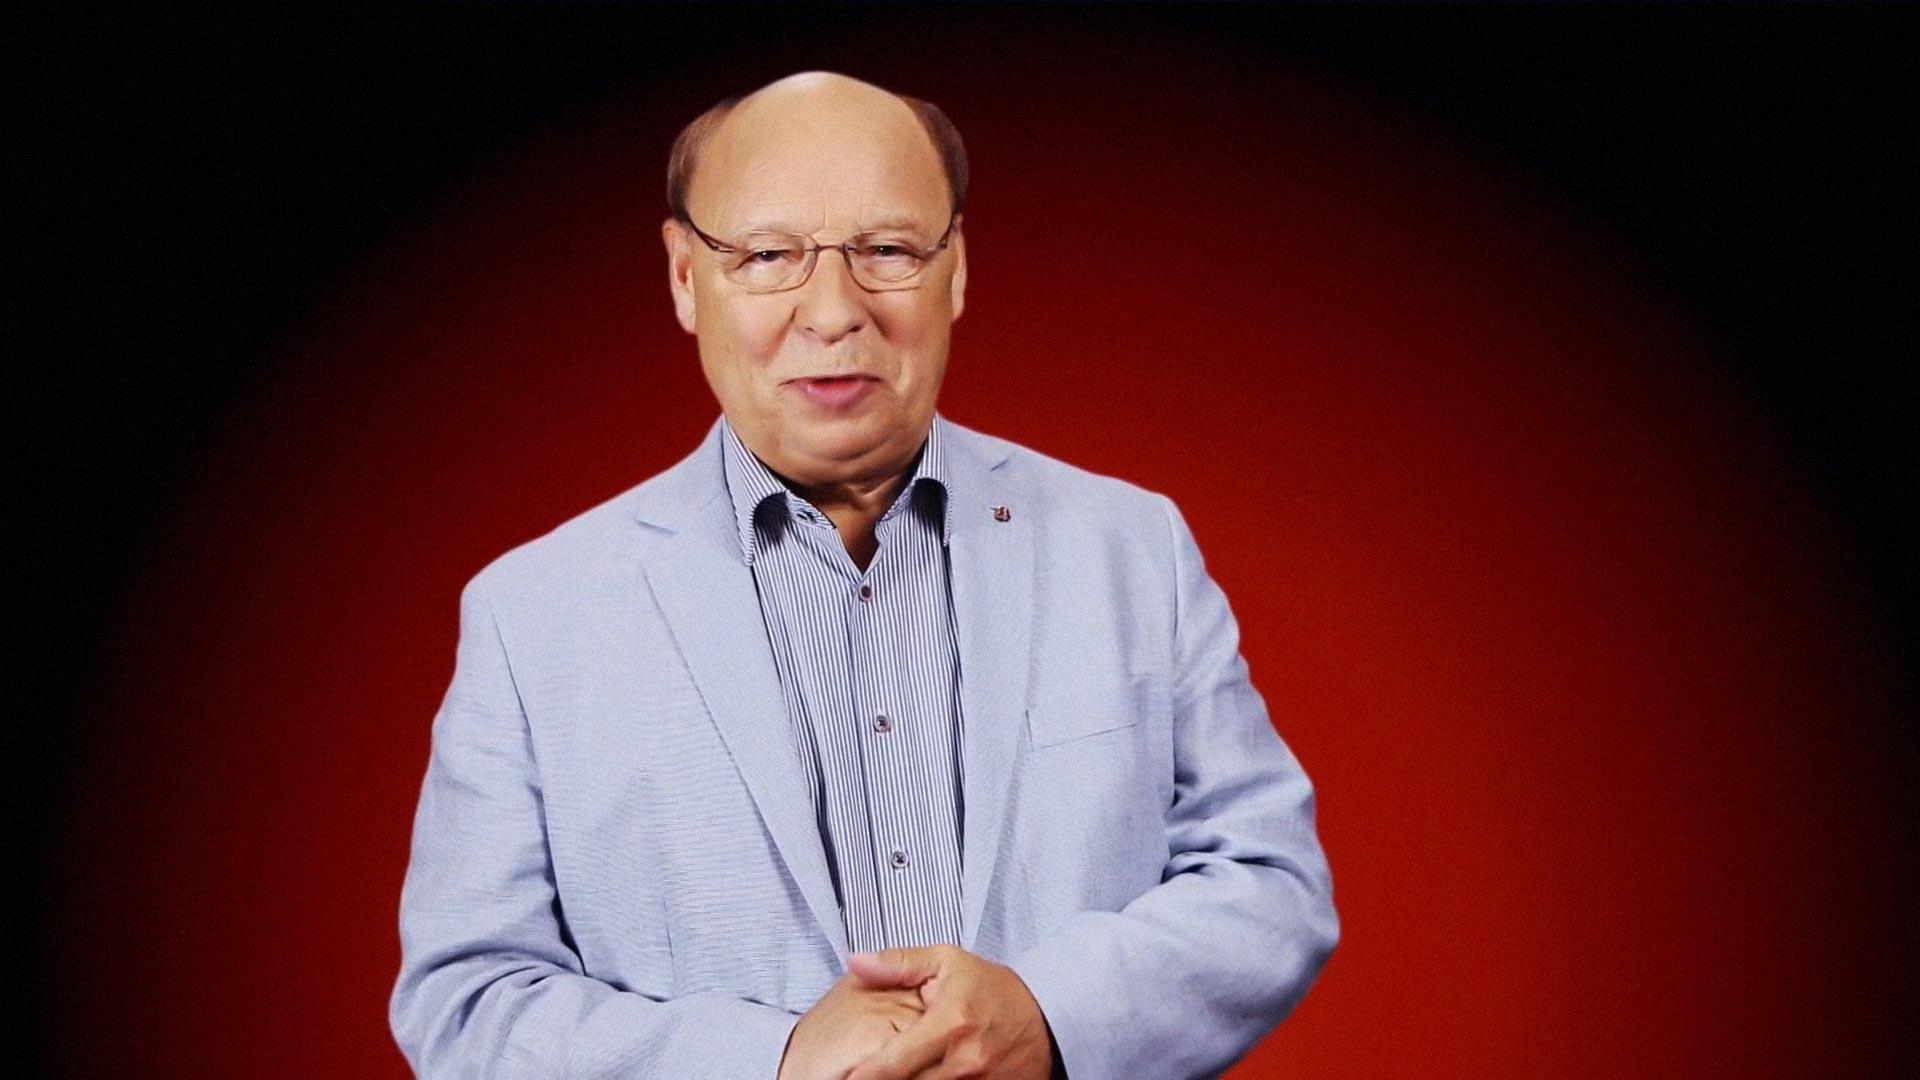 Hassknecht Fabian Koester Heute Show ZDF Oliver Welke Live Jetzt wird´s persönlich Hassknecht Politik Satire Humor